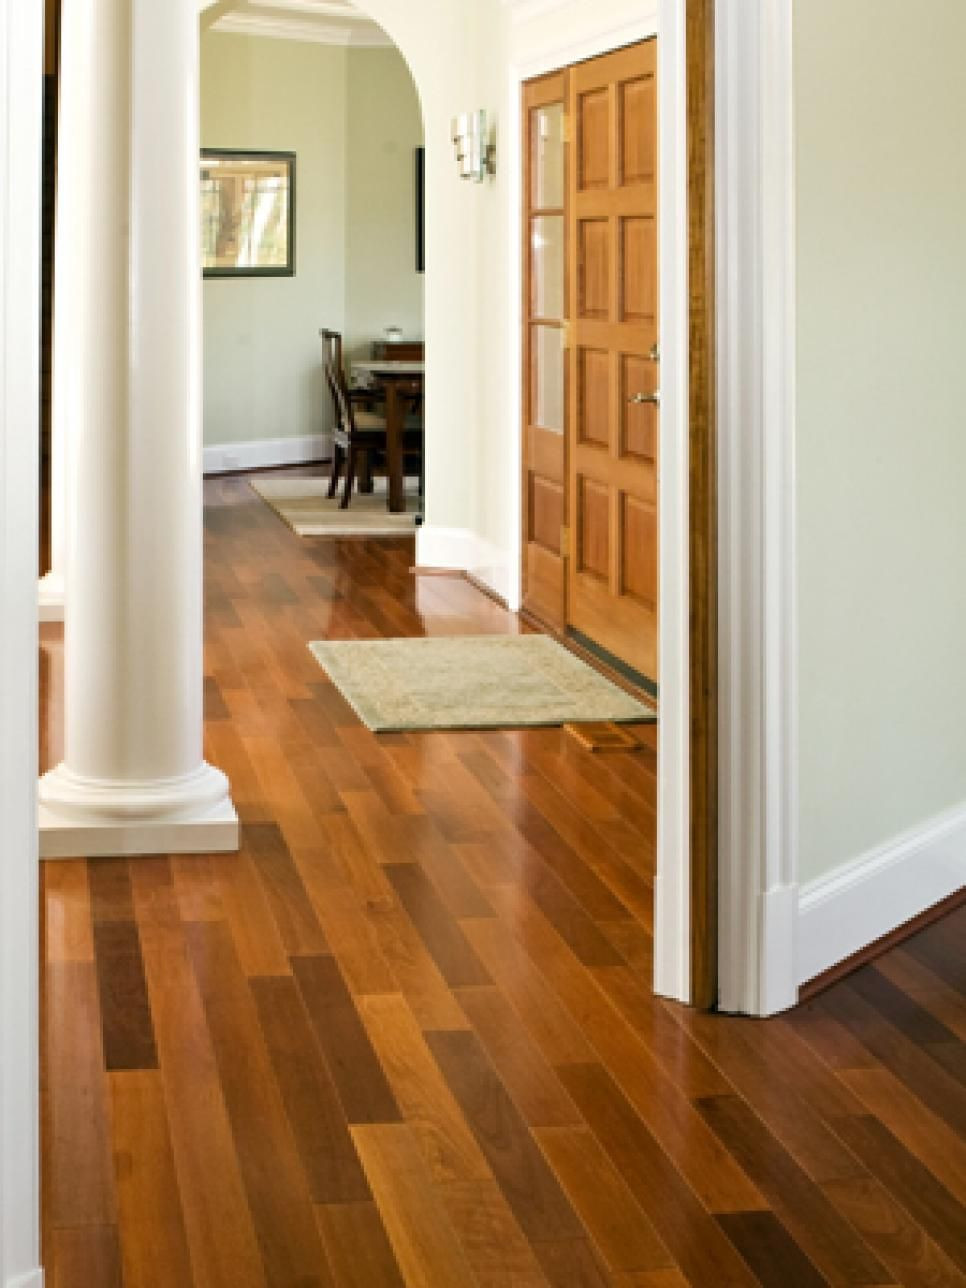 hardwood flooring ottawa ontario of 10 stunning hardwood flooring options interior design styles and regarding 10 stunning hardwood flooring options interior design styles and color schemes for home decorating